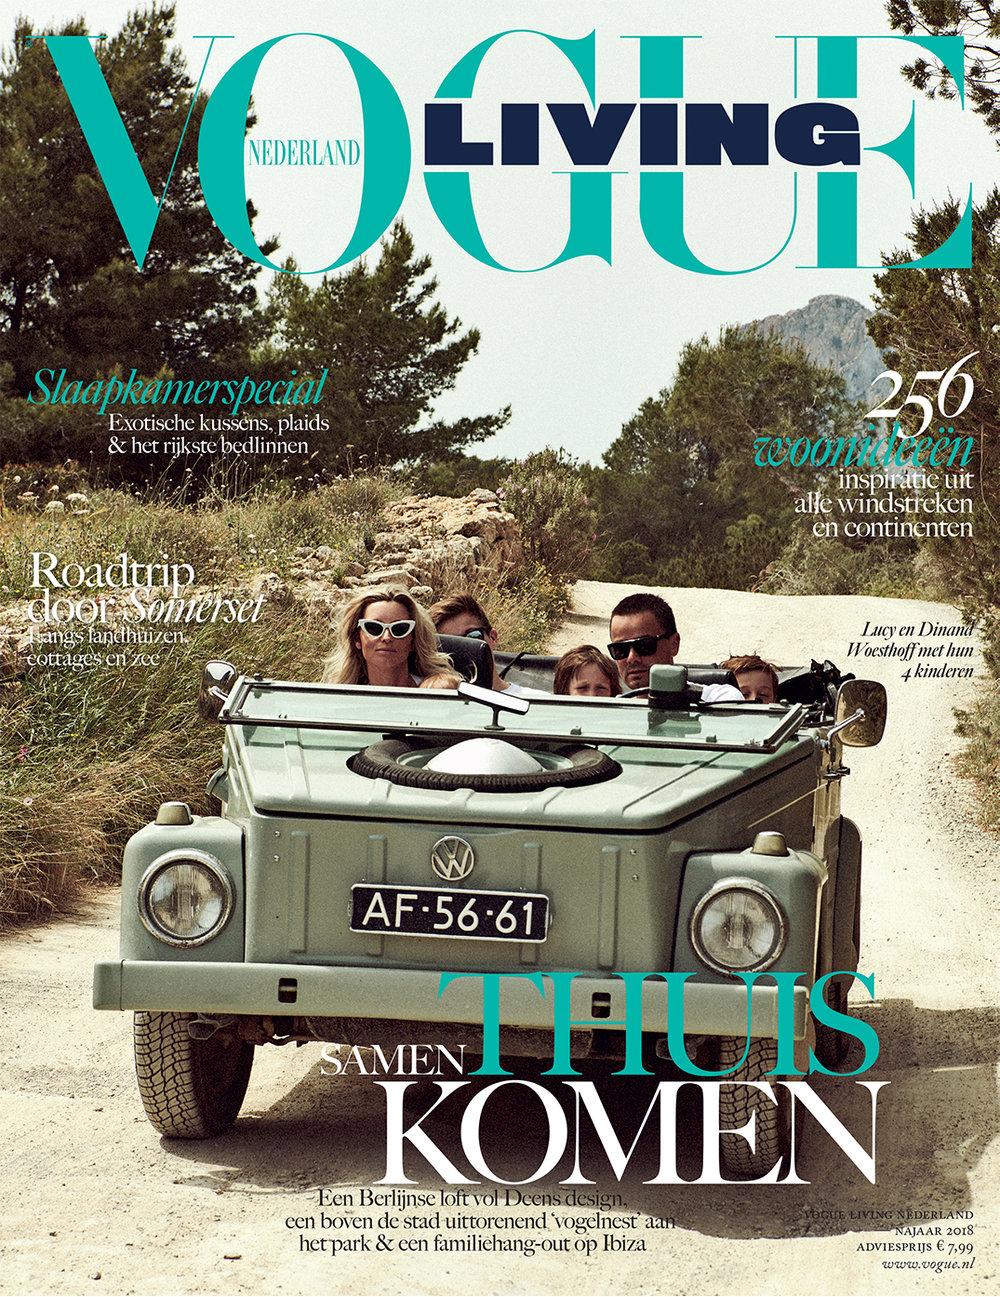 Vogue Living - September Issue 2018 -